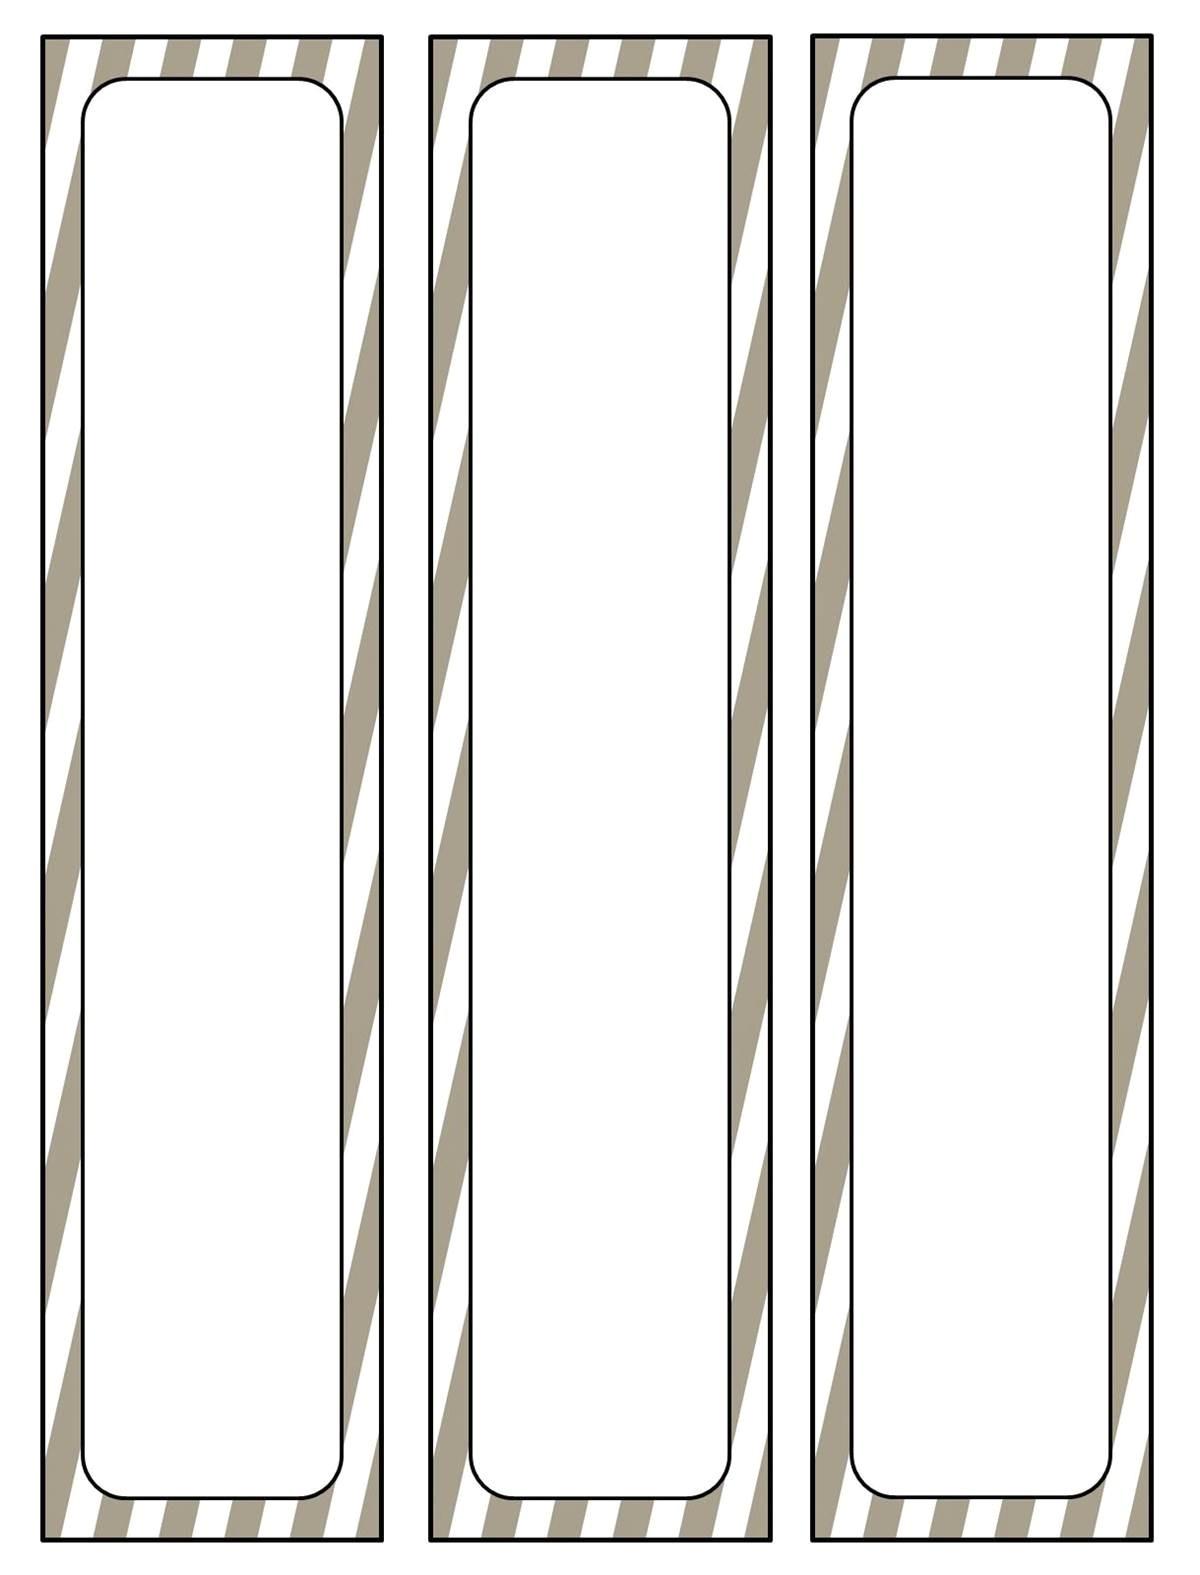 Avery Binder Cover Templates Free Binder Spine Template Beepmunk